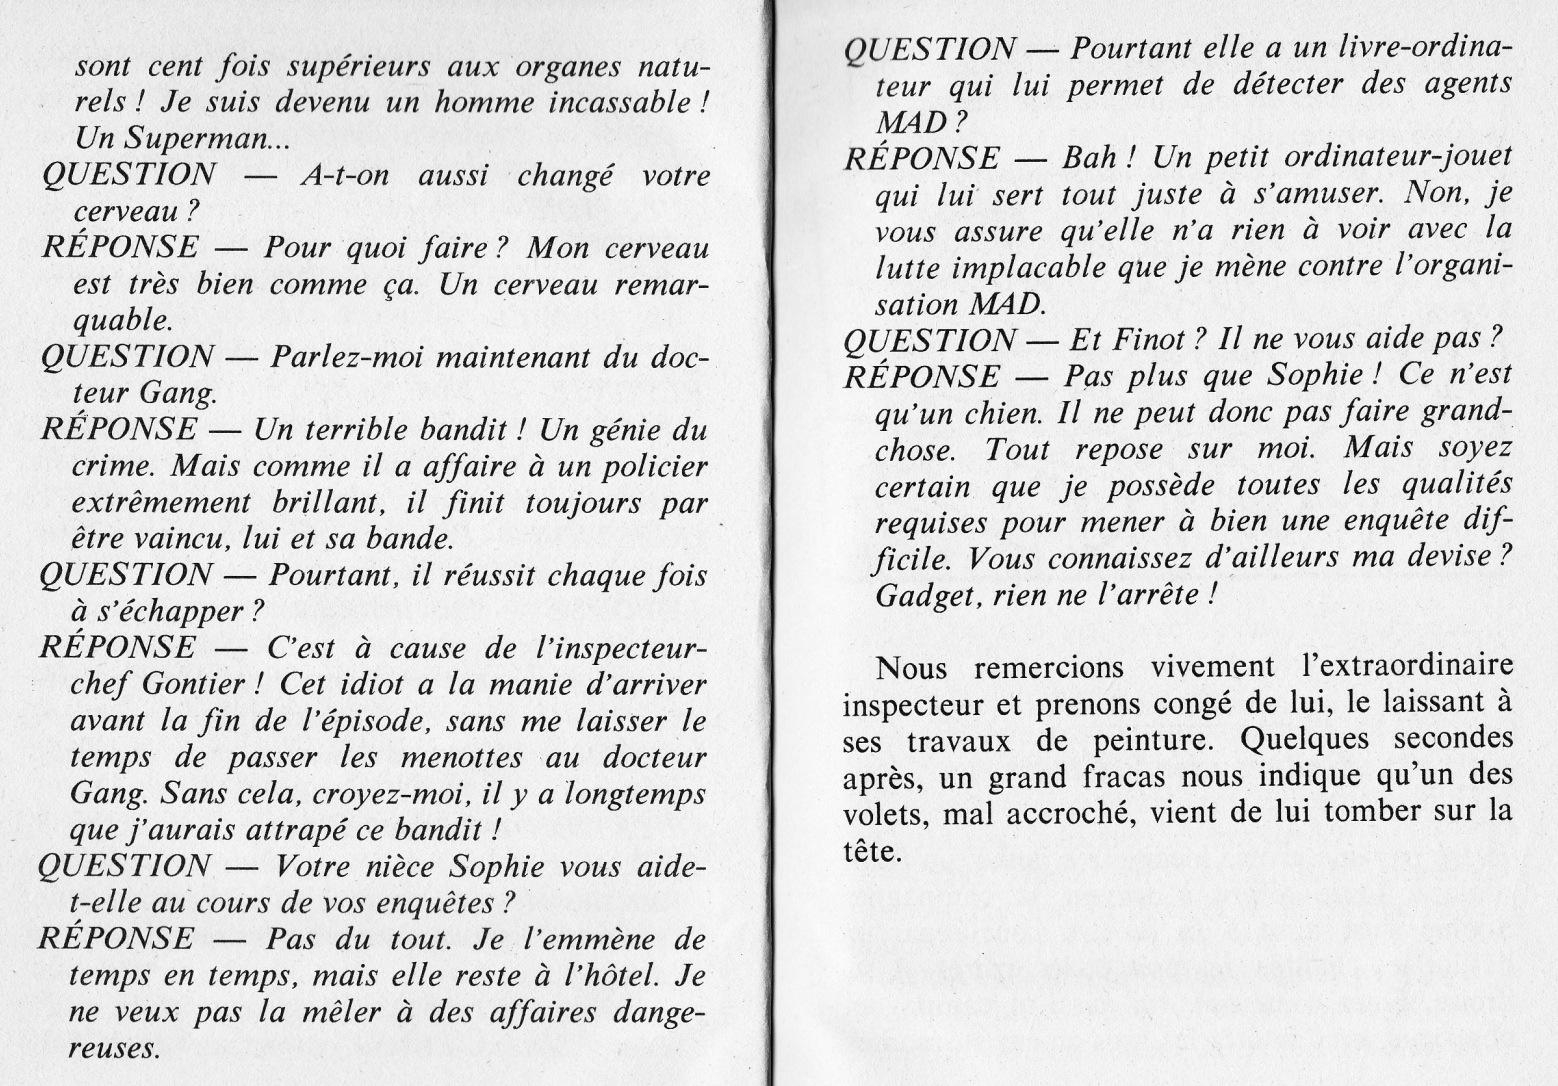 http://grenierdelatv.free.fr/2/inspecteurgadgetpasseattaque04.jpg